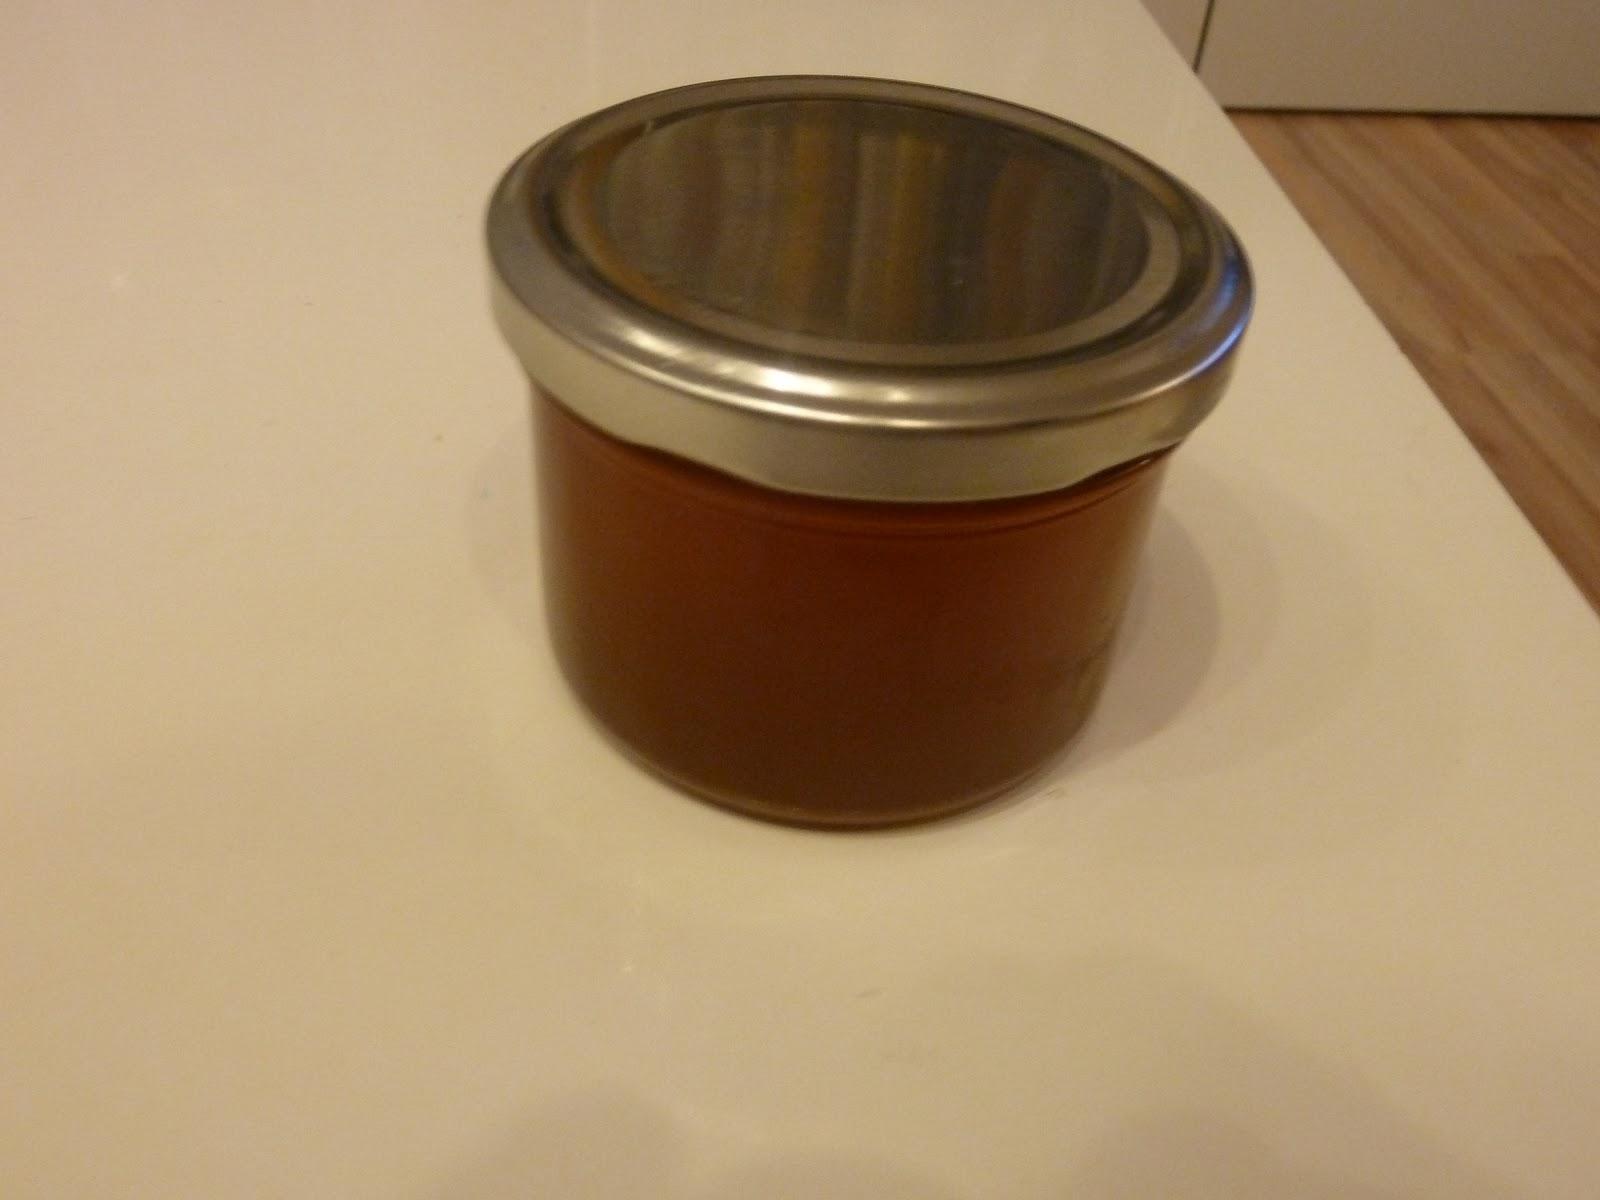 meine rezepte 3 neue marmeladen gelees. Black Bedroom Furniture Sets. Home Design Ideas